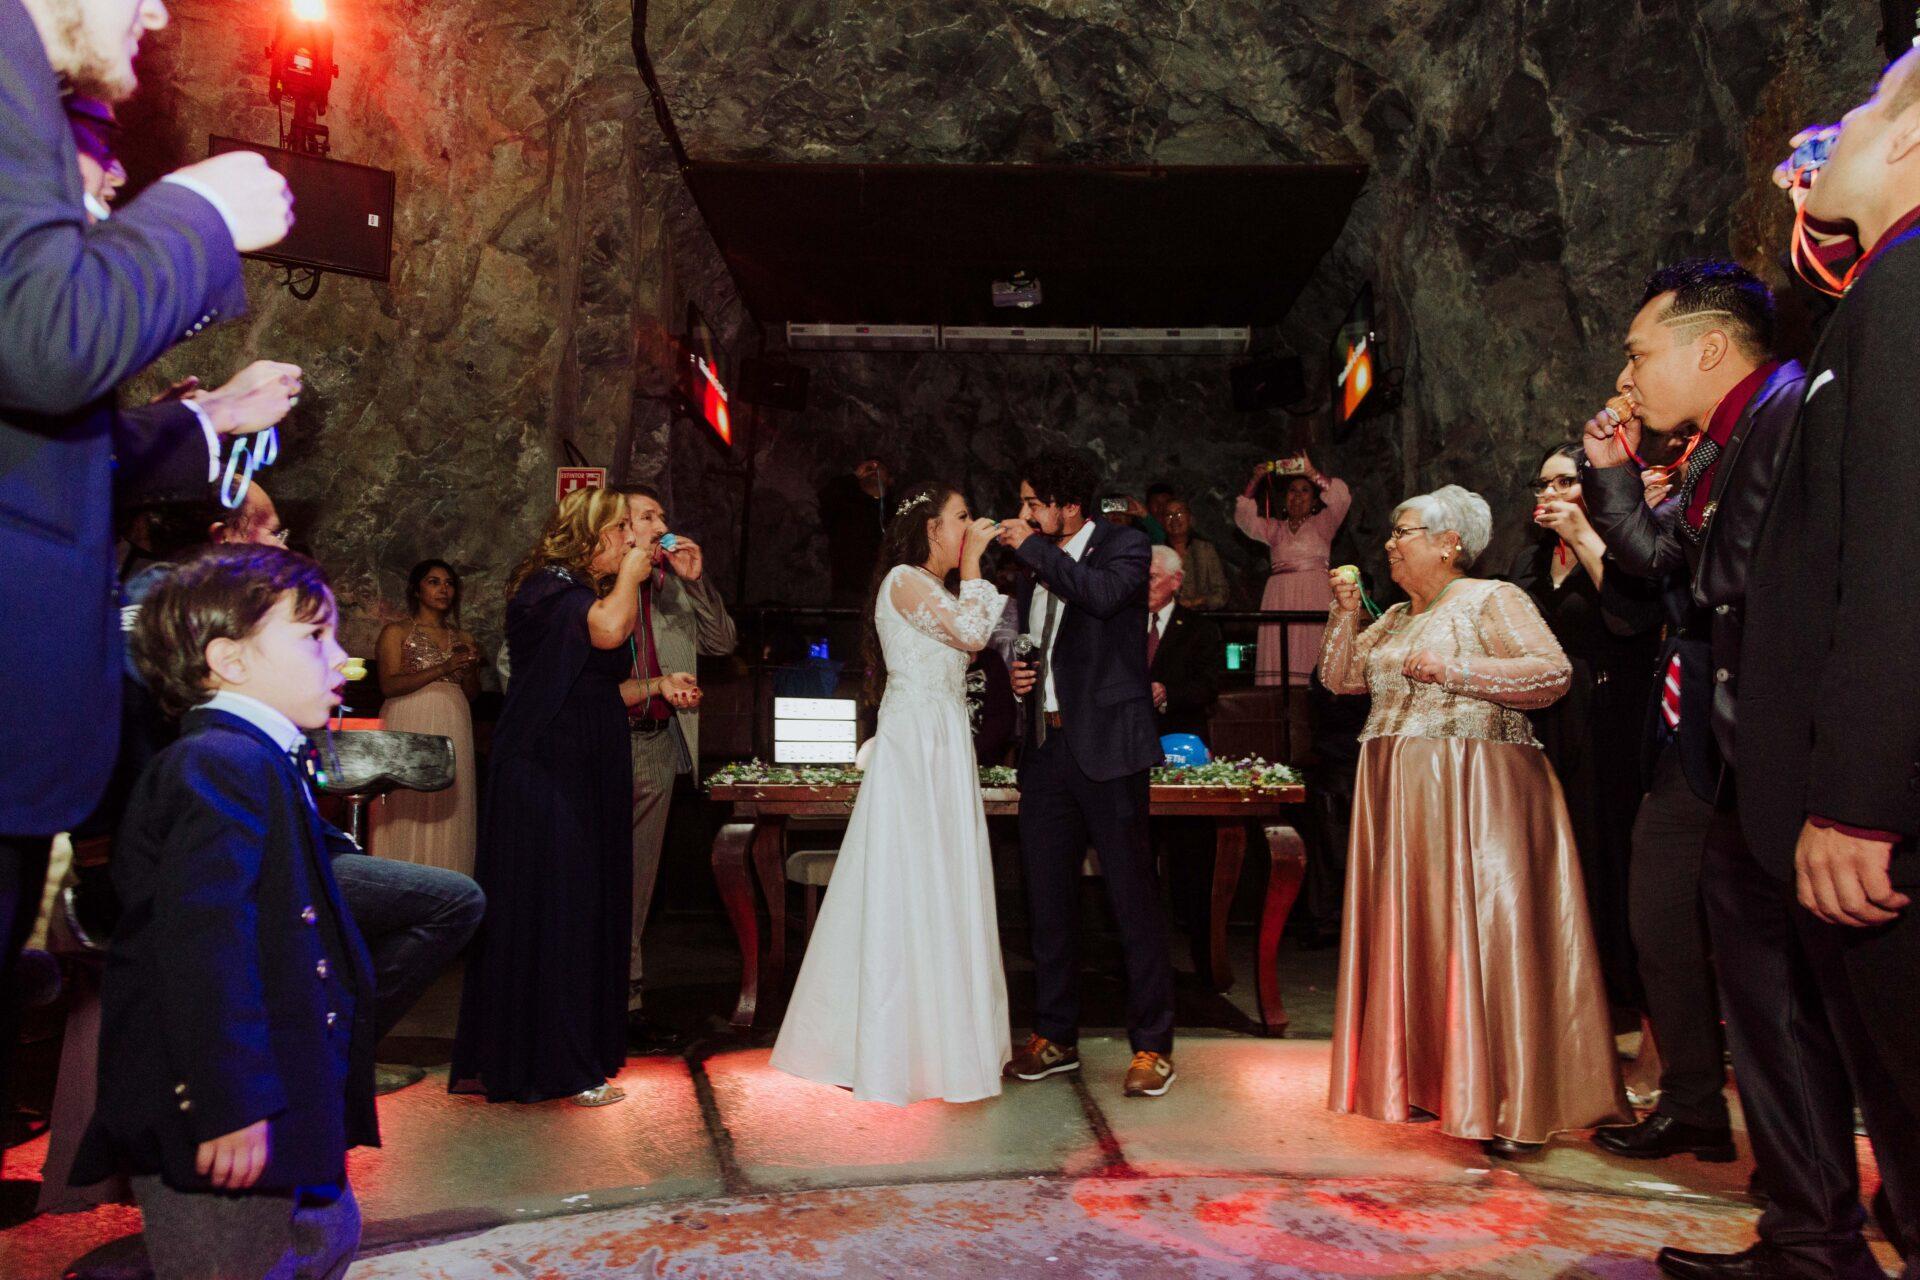 javier_noriega_fotografo_bodas_la_mina_club_zacatecas_wedding_photographer15